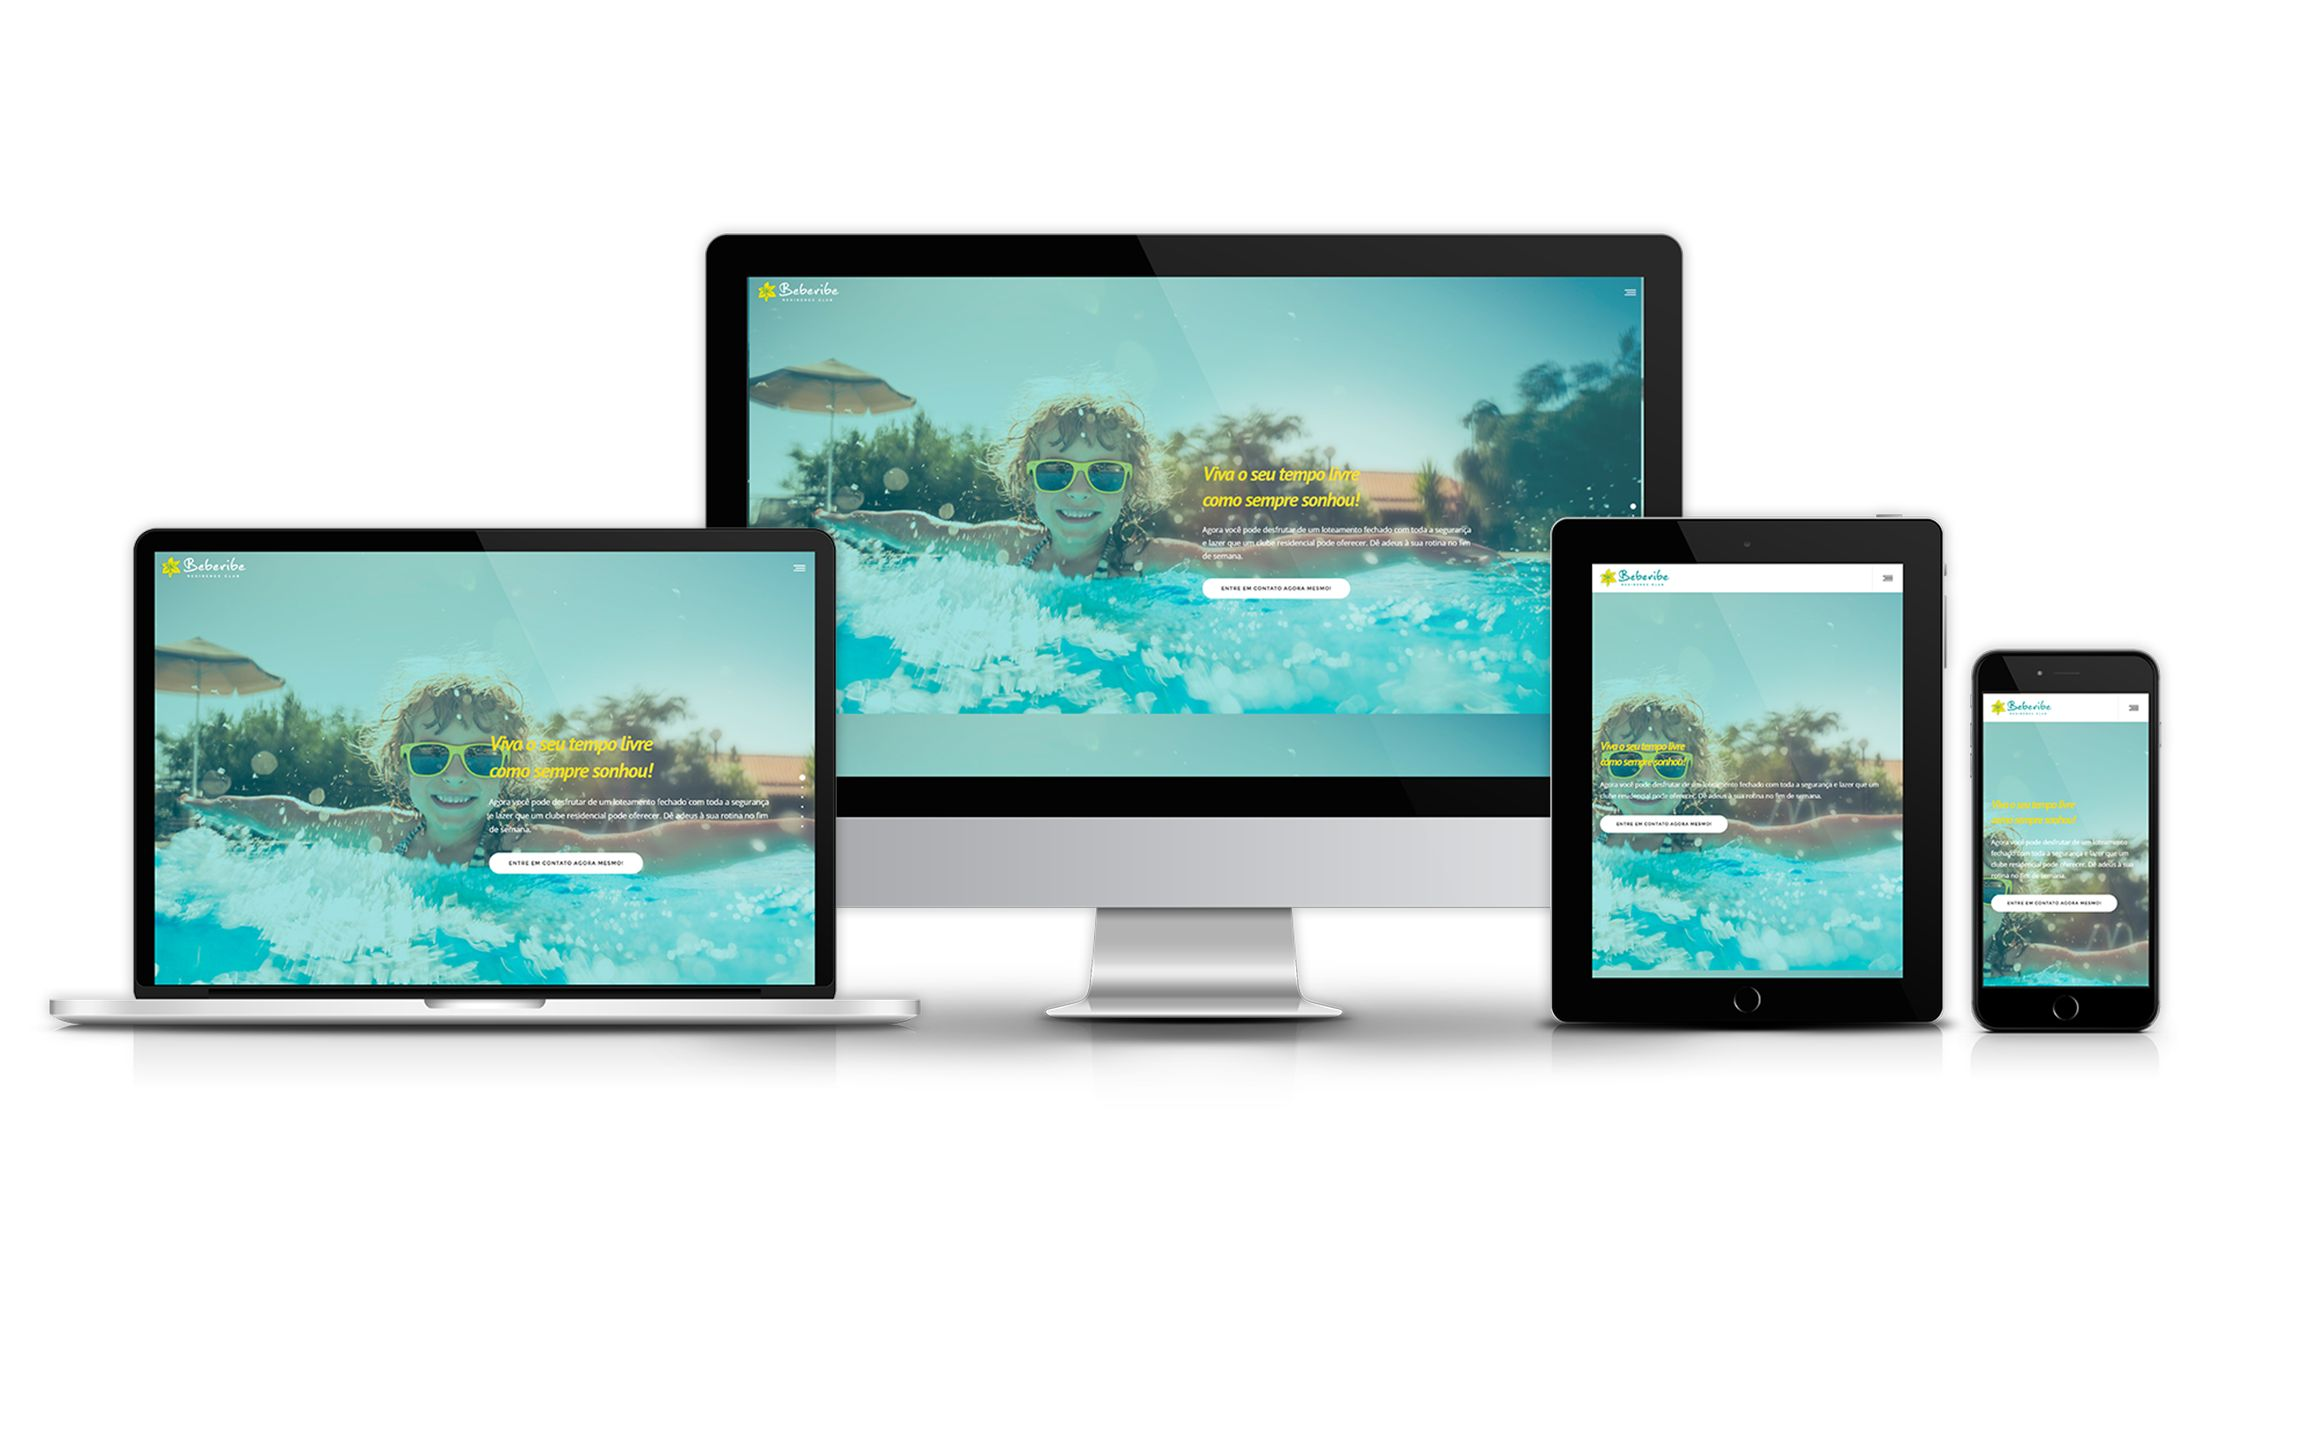 landing-page-beberibe-residence-club-ebano-engenharia-portfolio-agencia-diretriz-digital-marketing2